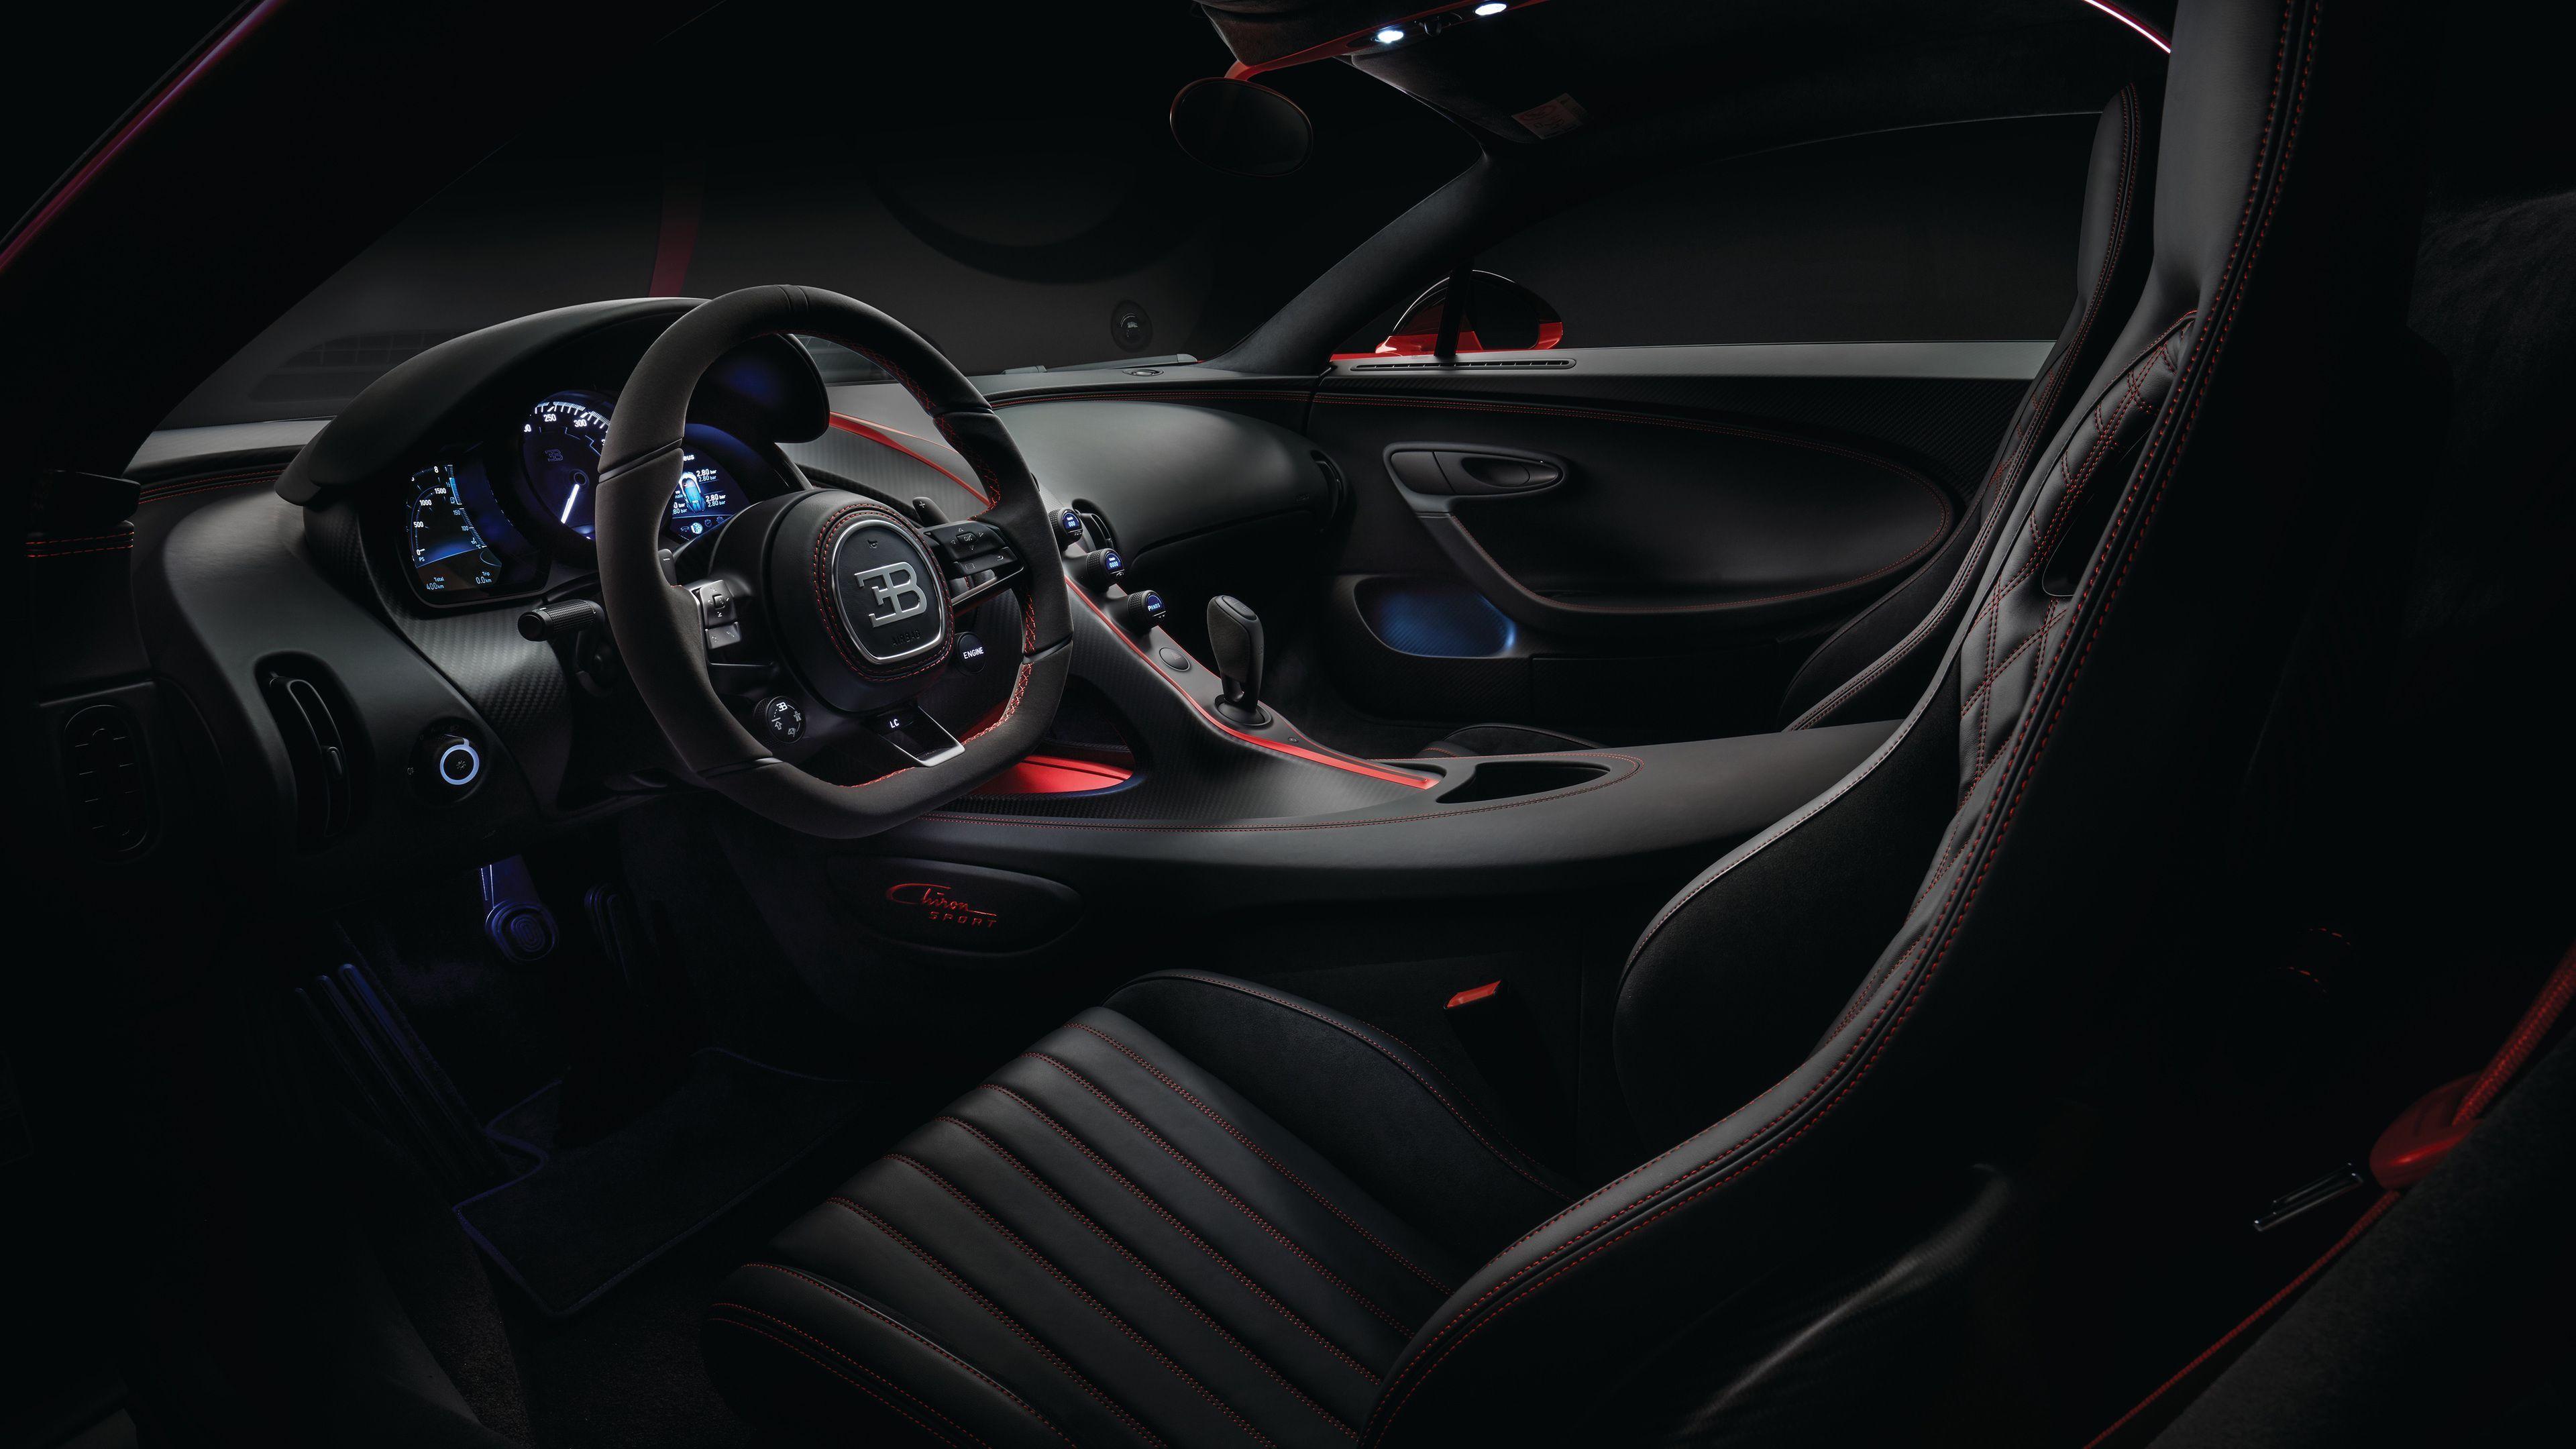 Bugatti Chiron Interior 2018 4k Interior Wallpapers Hd Wallpapers Cars Wallpapers Bugatti Wallpape Bugatti Chiron Interior Bugatti Wallpapers Bugatti Chiron